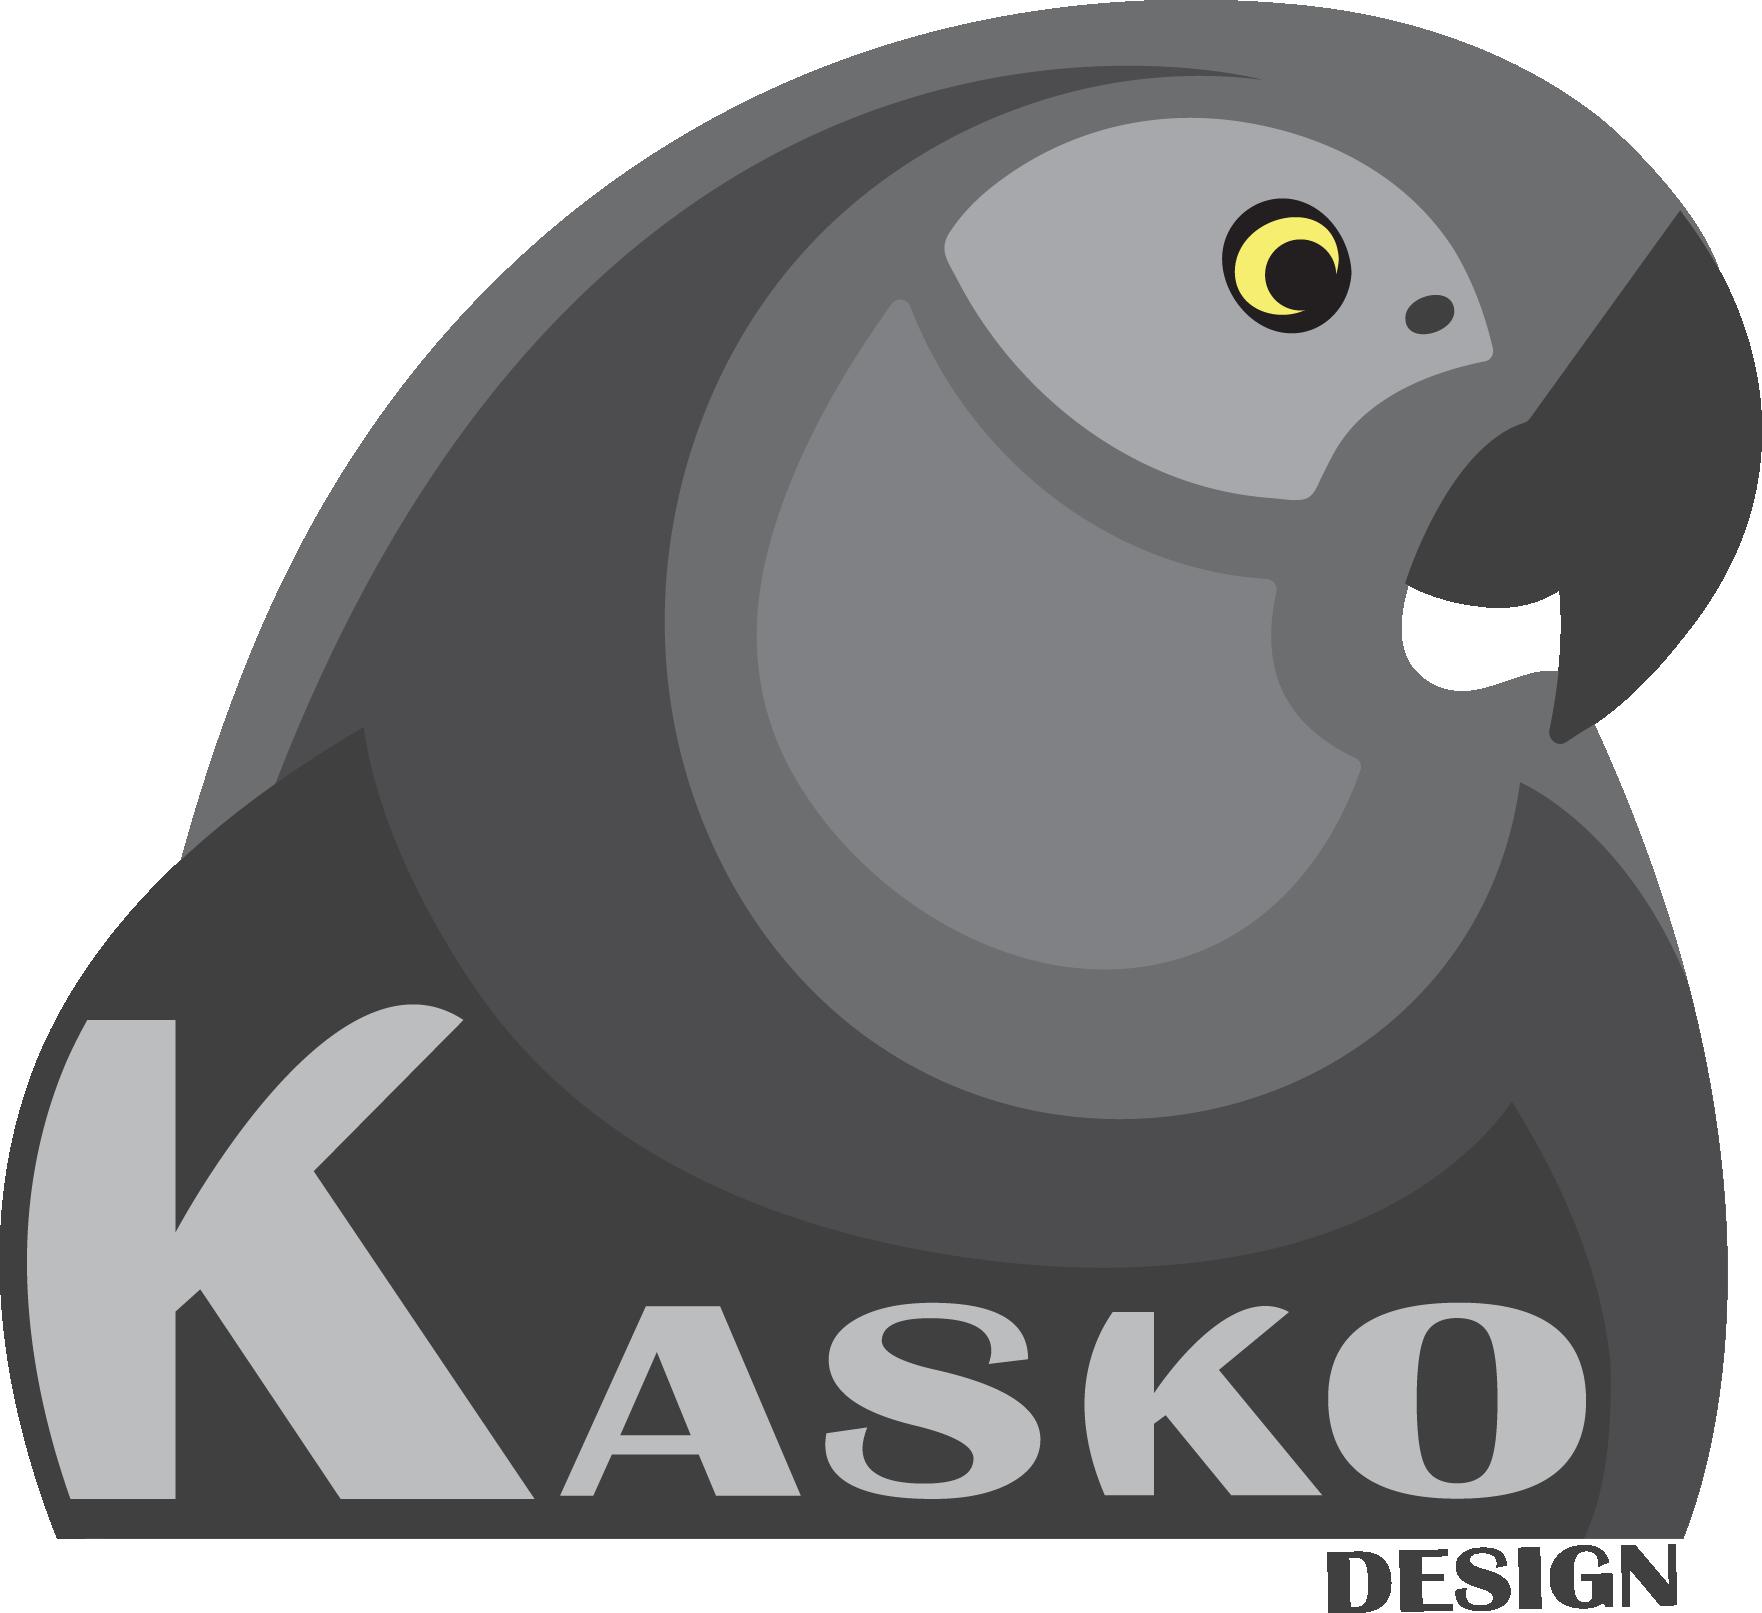 kasko design